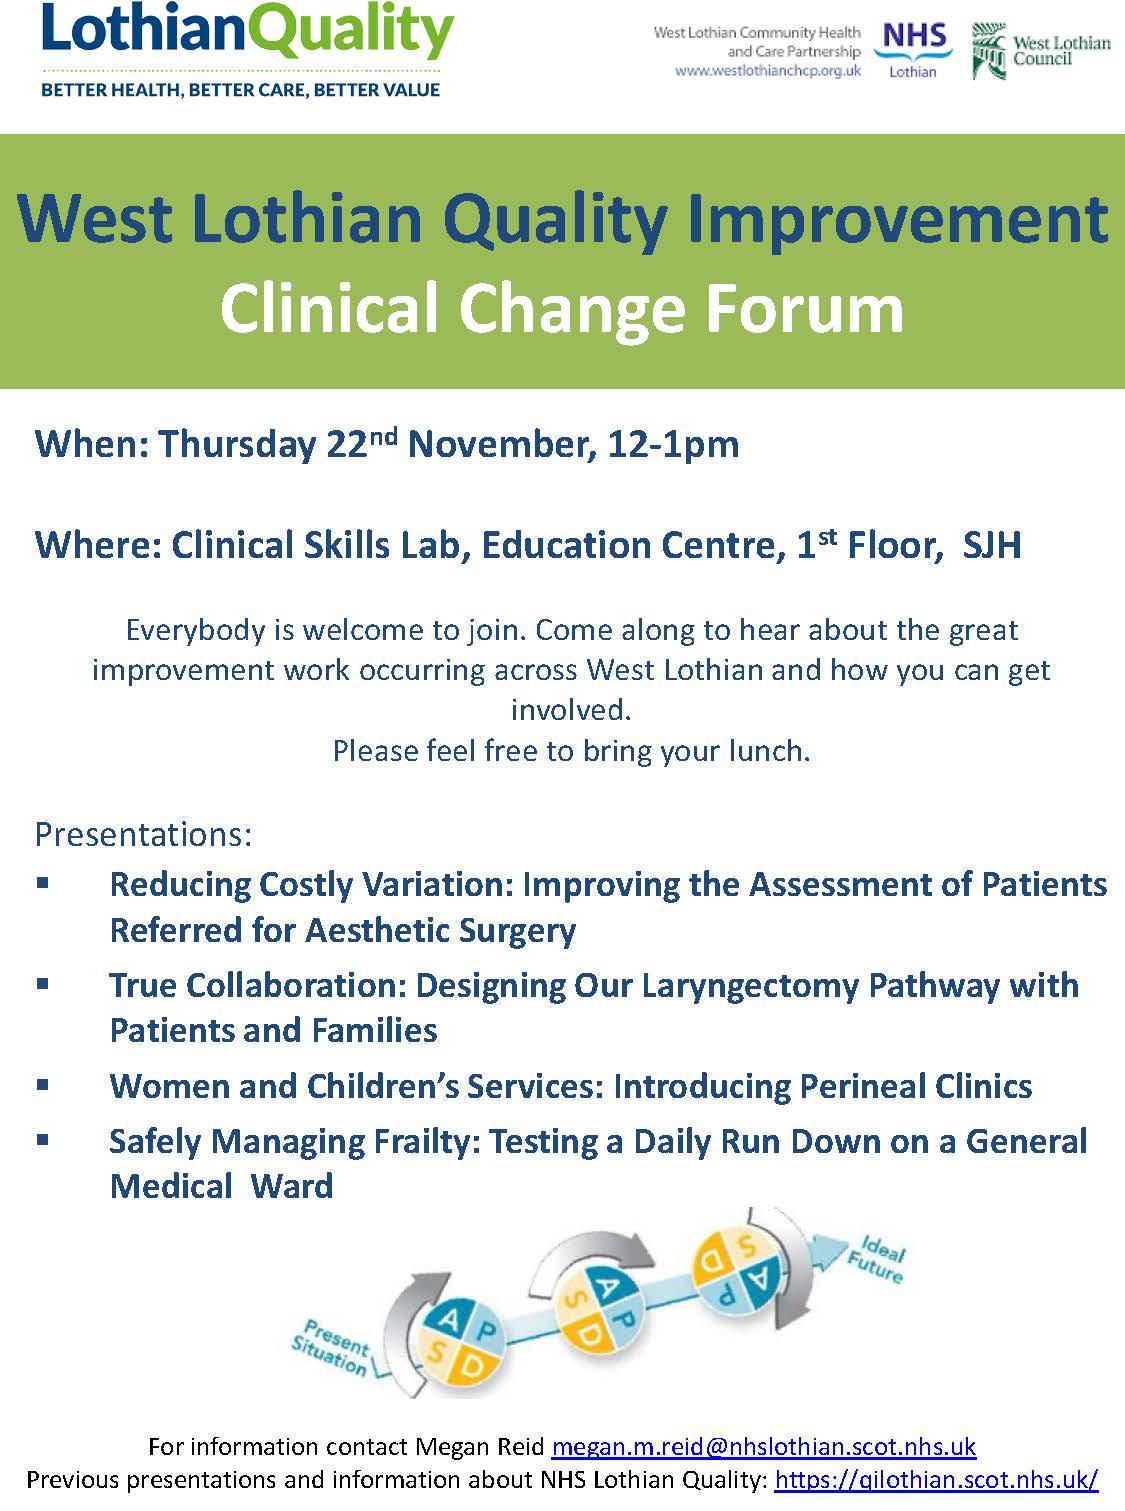 Clinical Change Forum 22nd November Poster.jpg